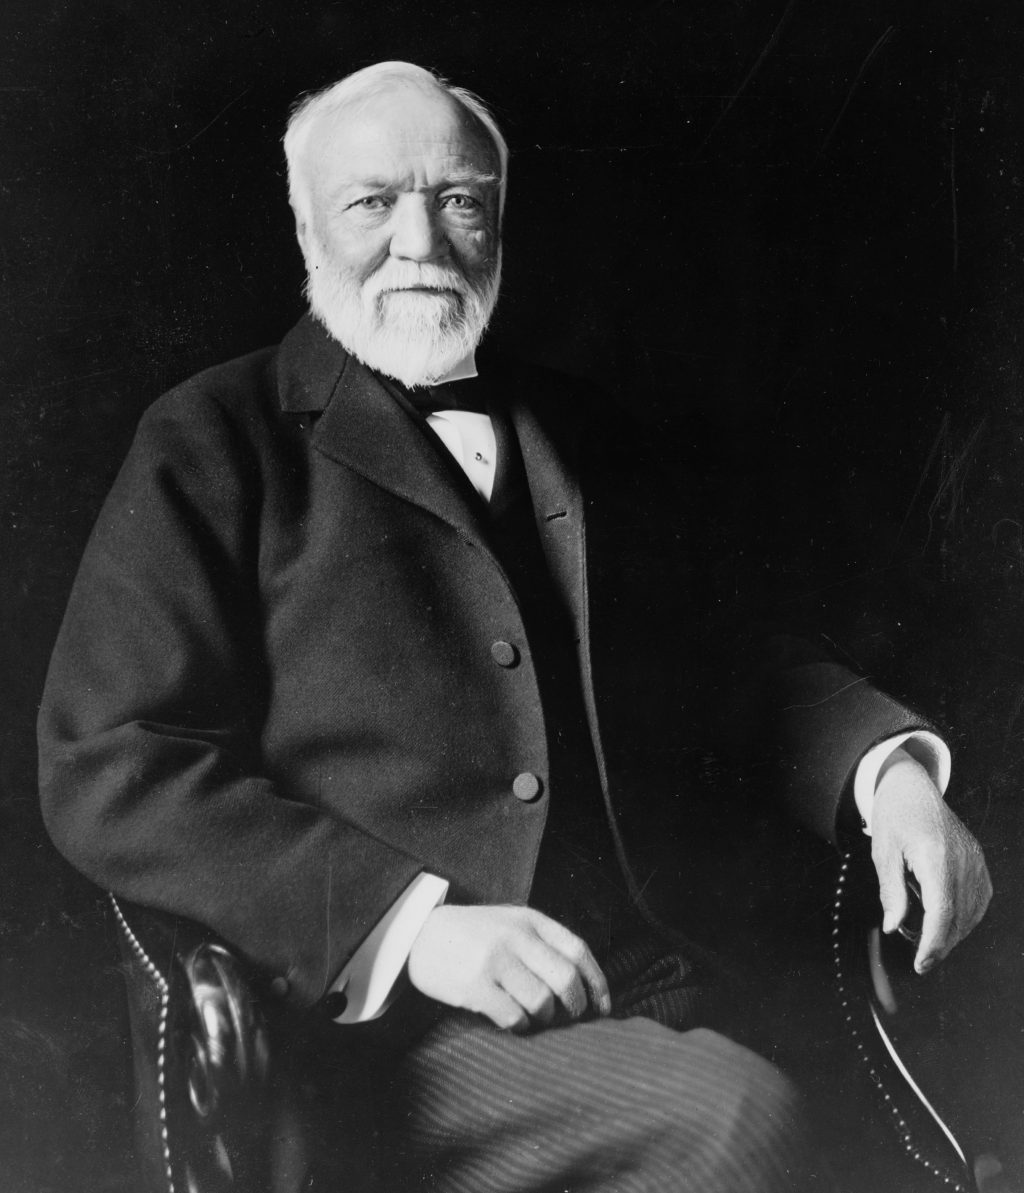 Retrato de Andrew Carnegie